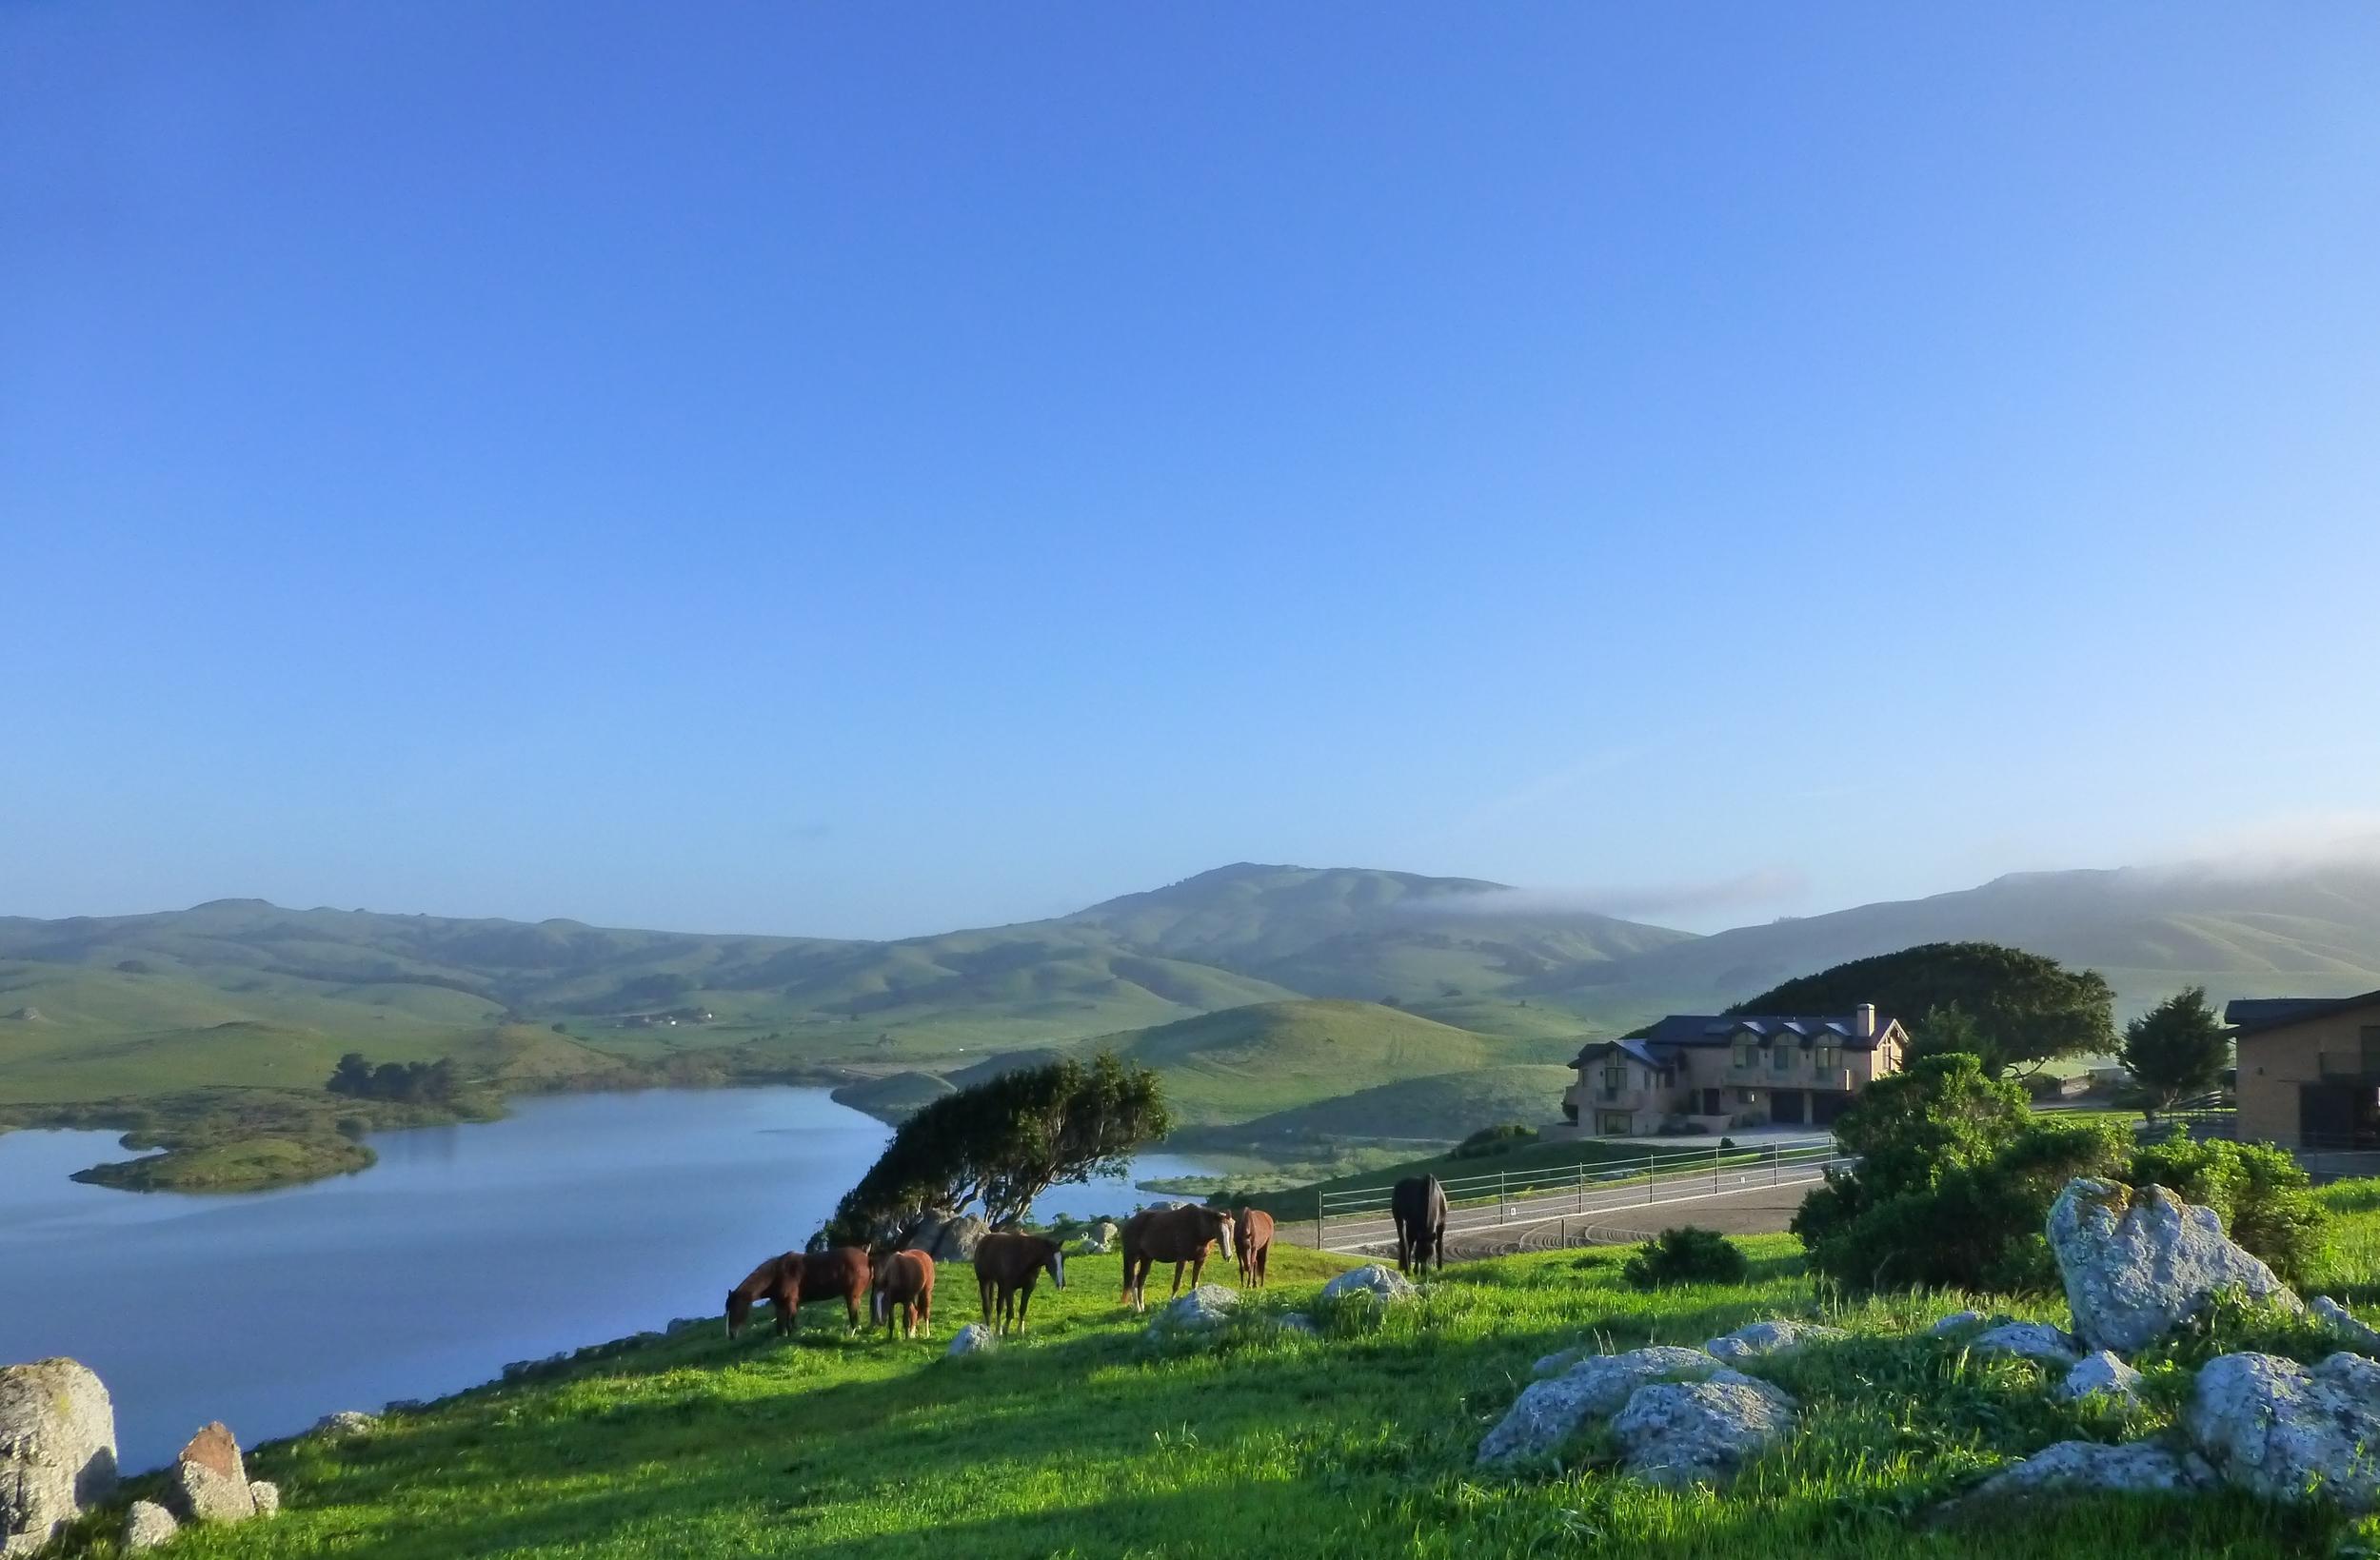 April morning.house,arena.horses at rocks and tree.P1030502.JPG